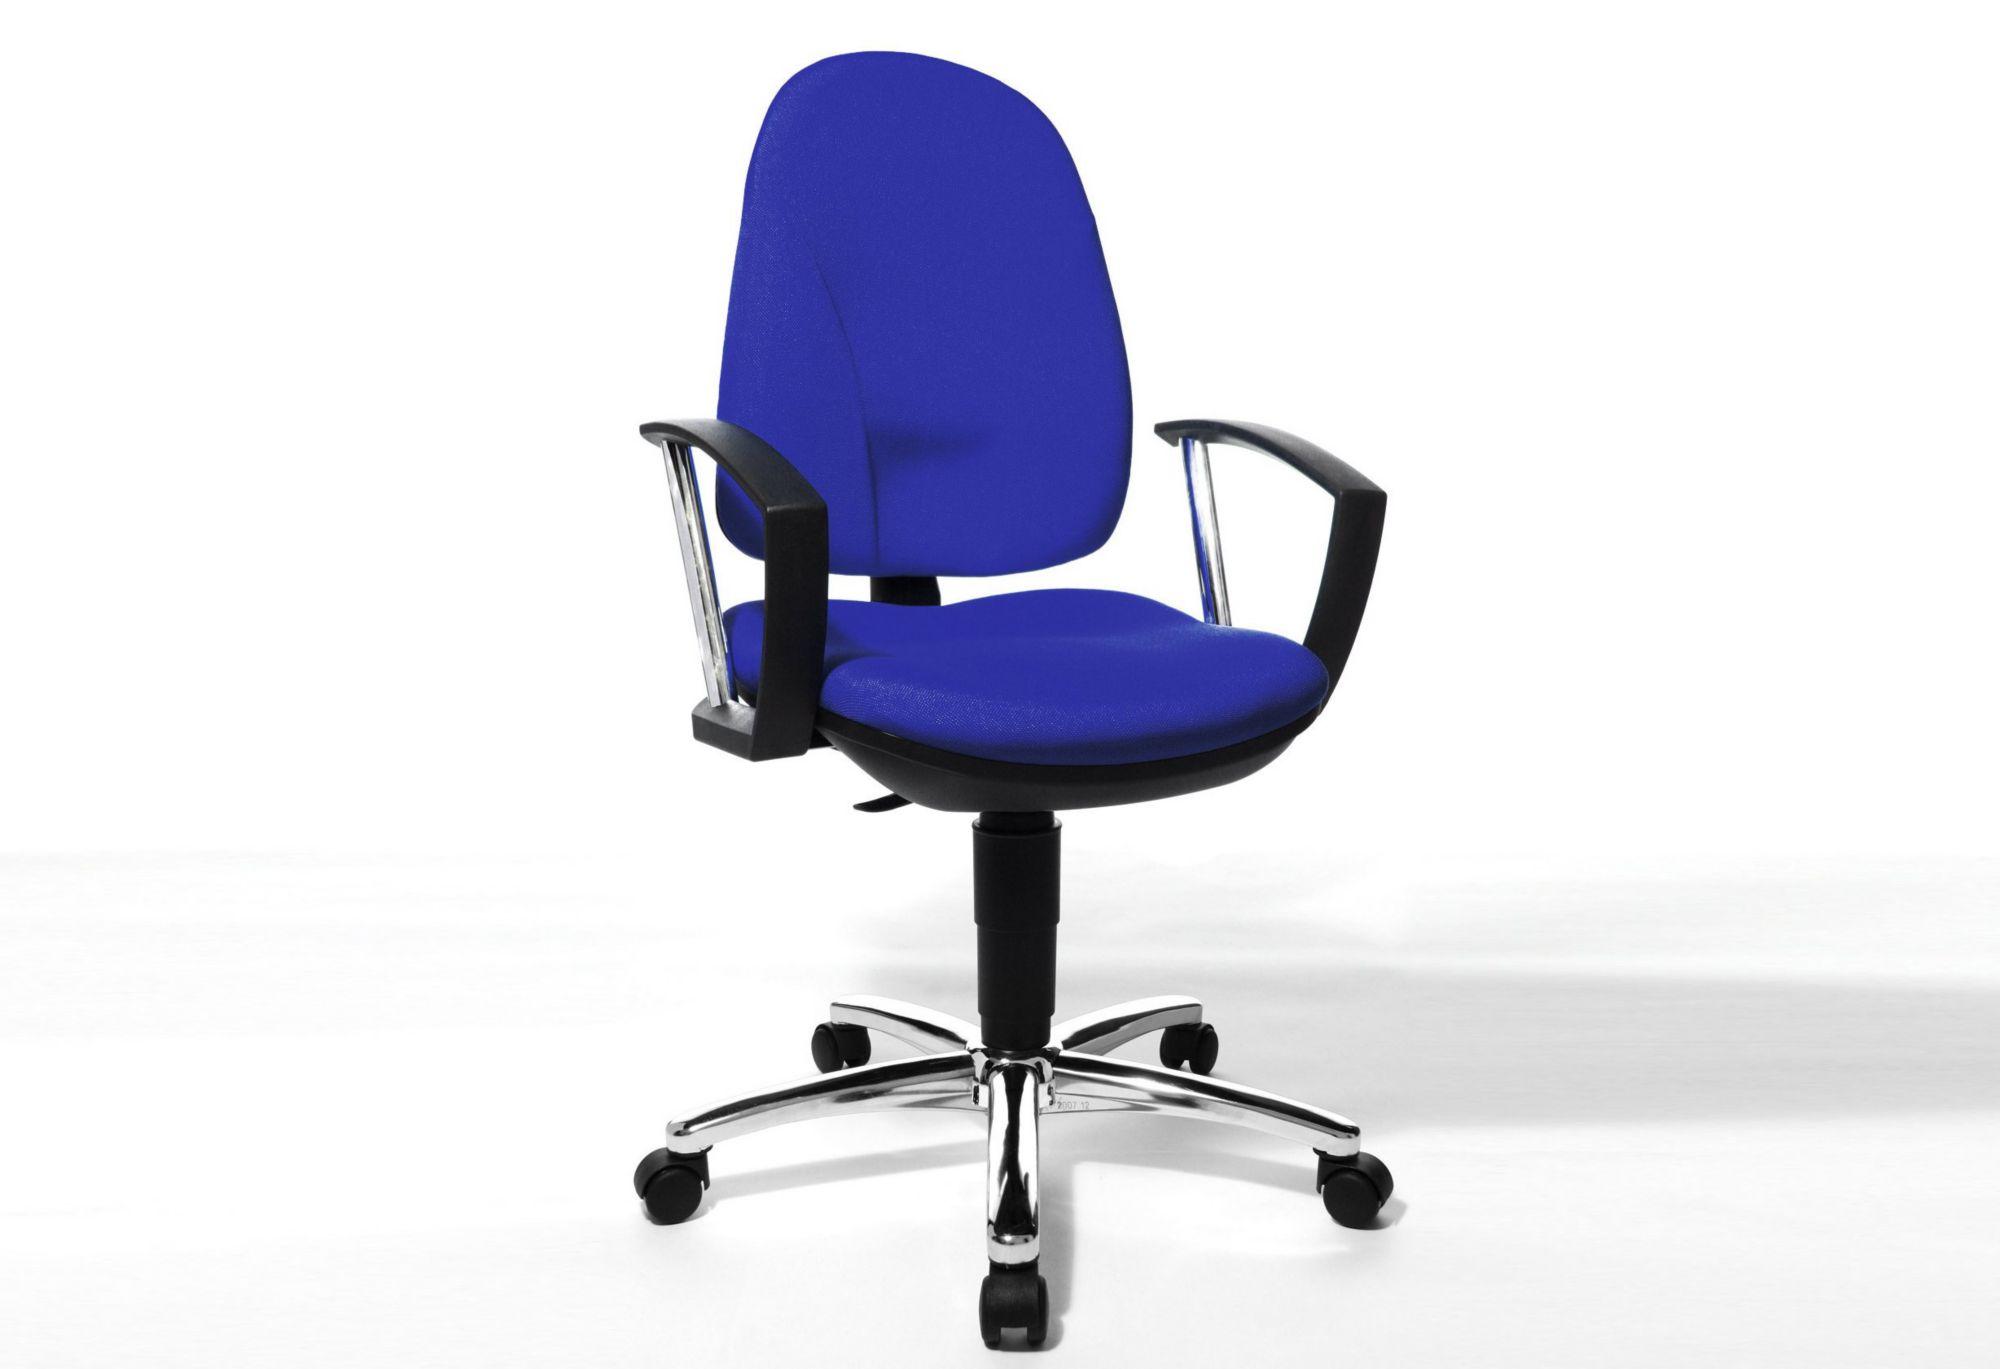 Topstar Bürostuhl  Home Chair 70 ? Deluxe  Preisvergleich